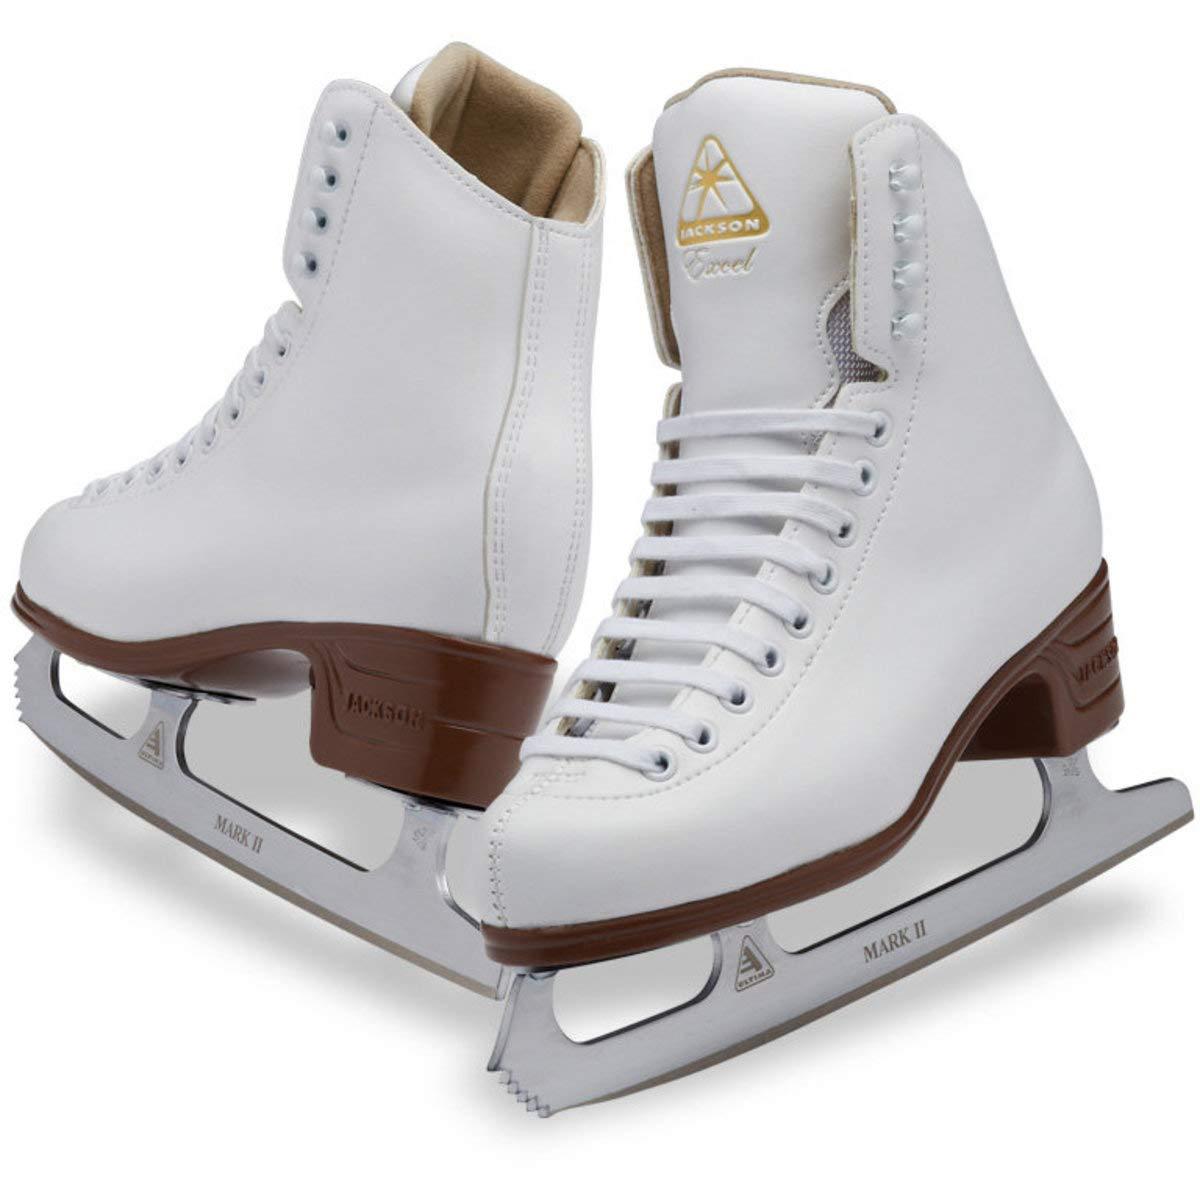 Jackson Ultima Excel JS1291 Girl's Ice Skates